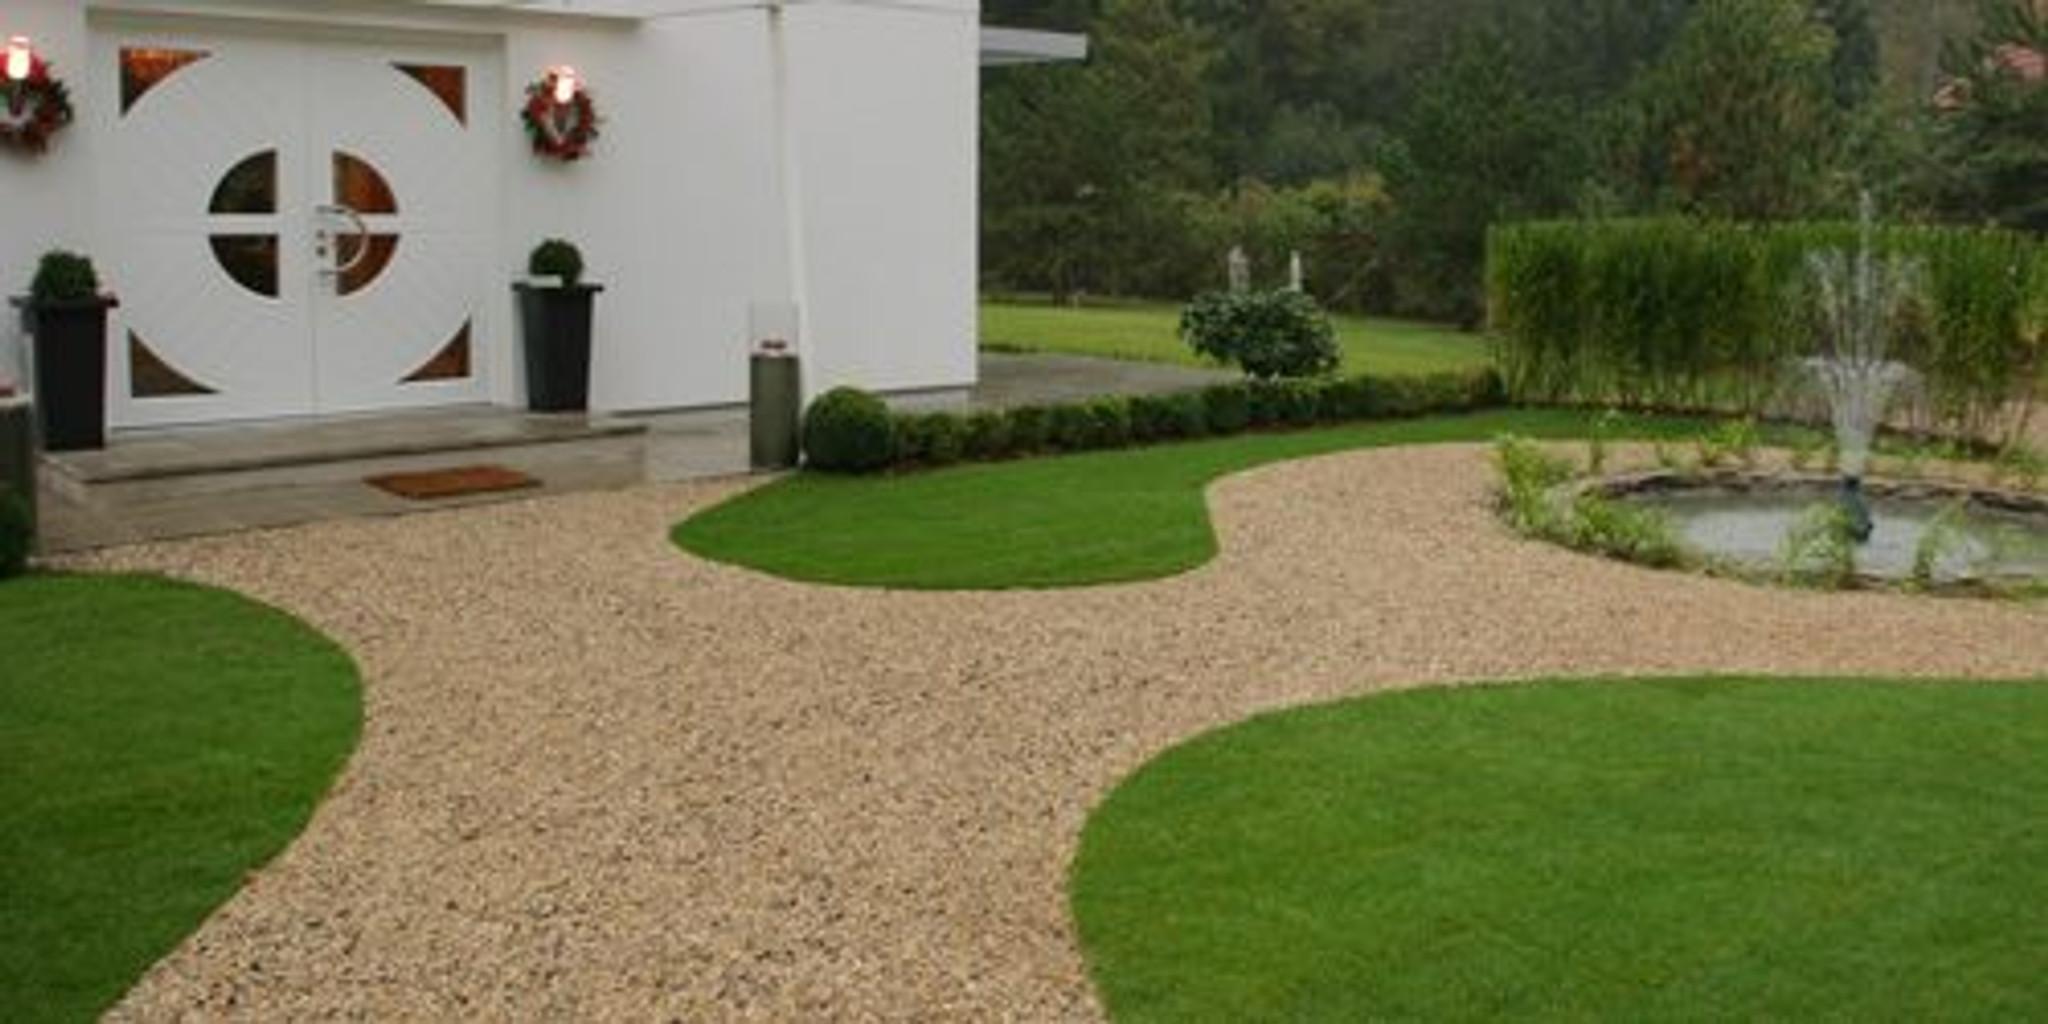 Deep lawn edging paths